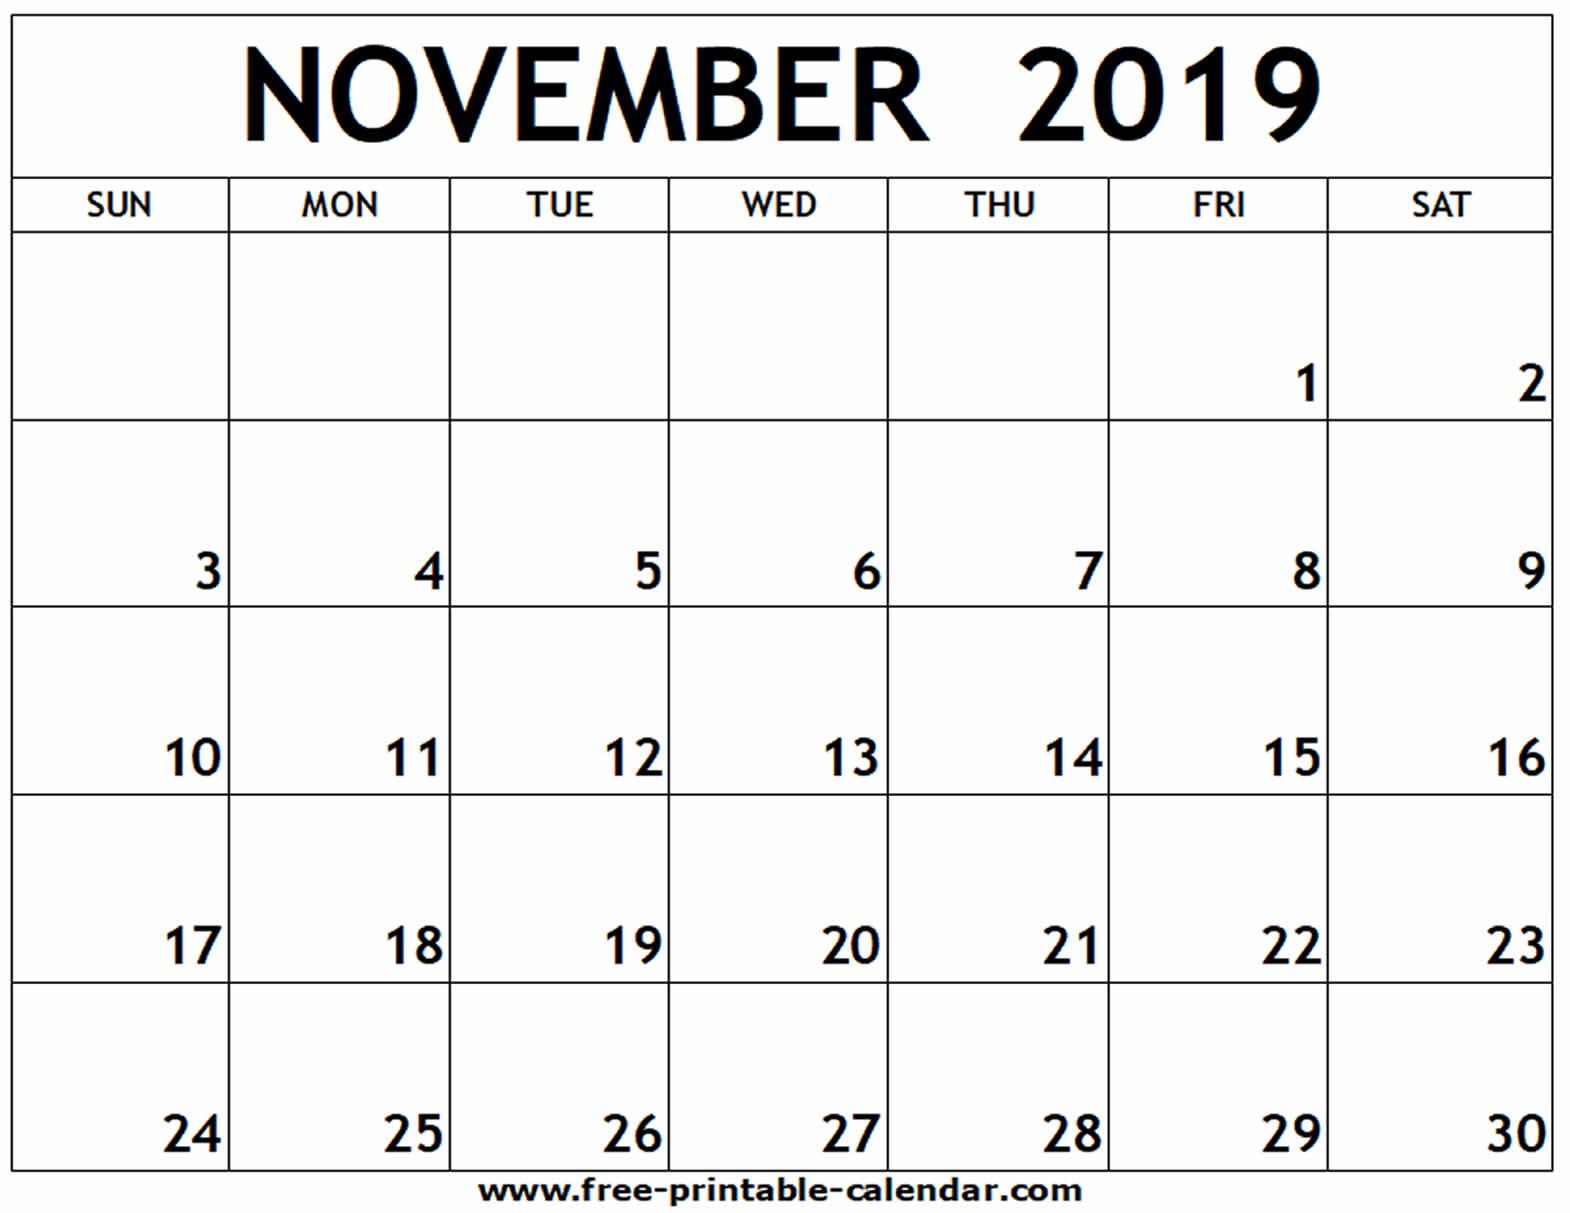 Free Printable Calendars - Wpa.wpart.co